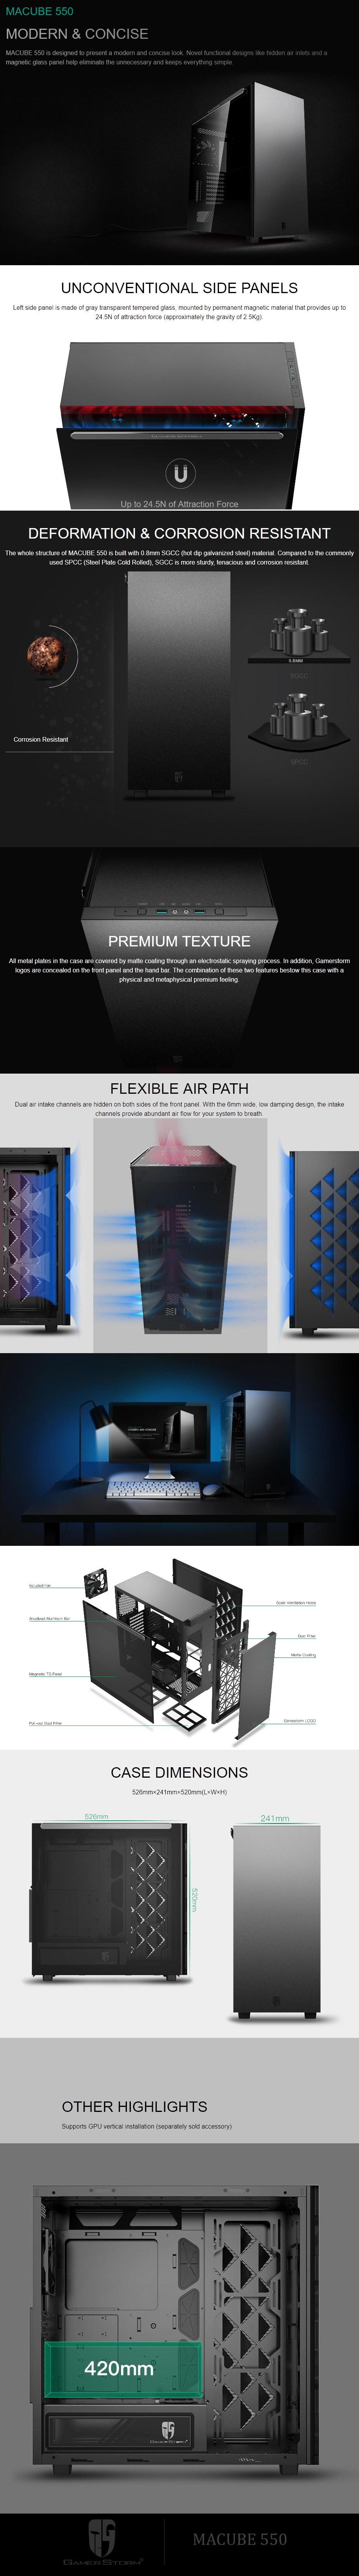 DeepCool Macube 550 Minimalist Full Tower Case Tempered Glass Side Panel Black